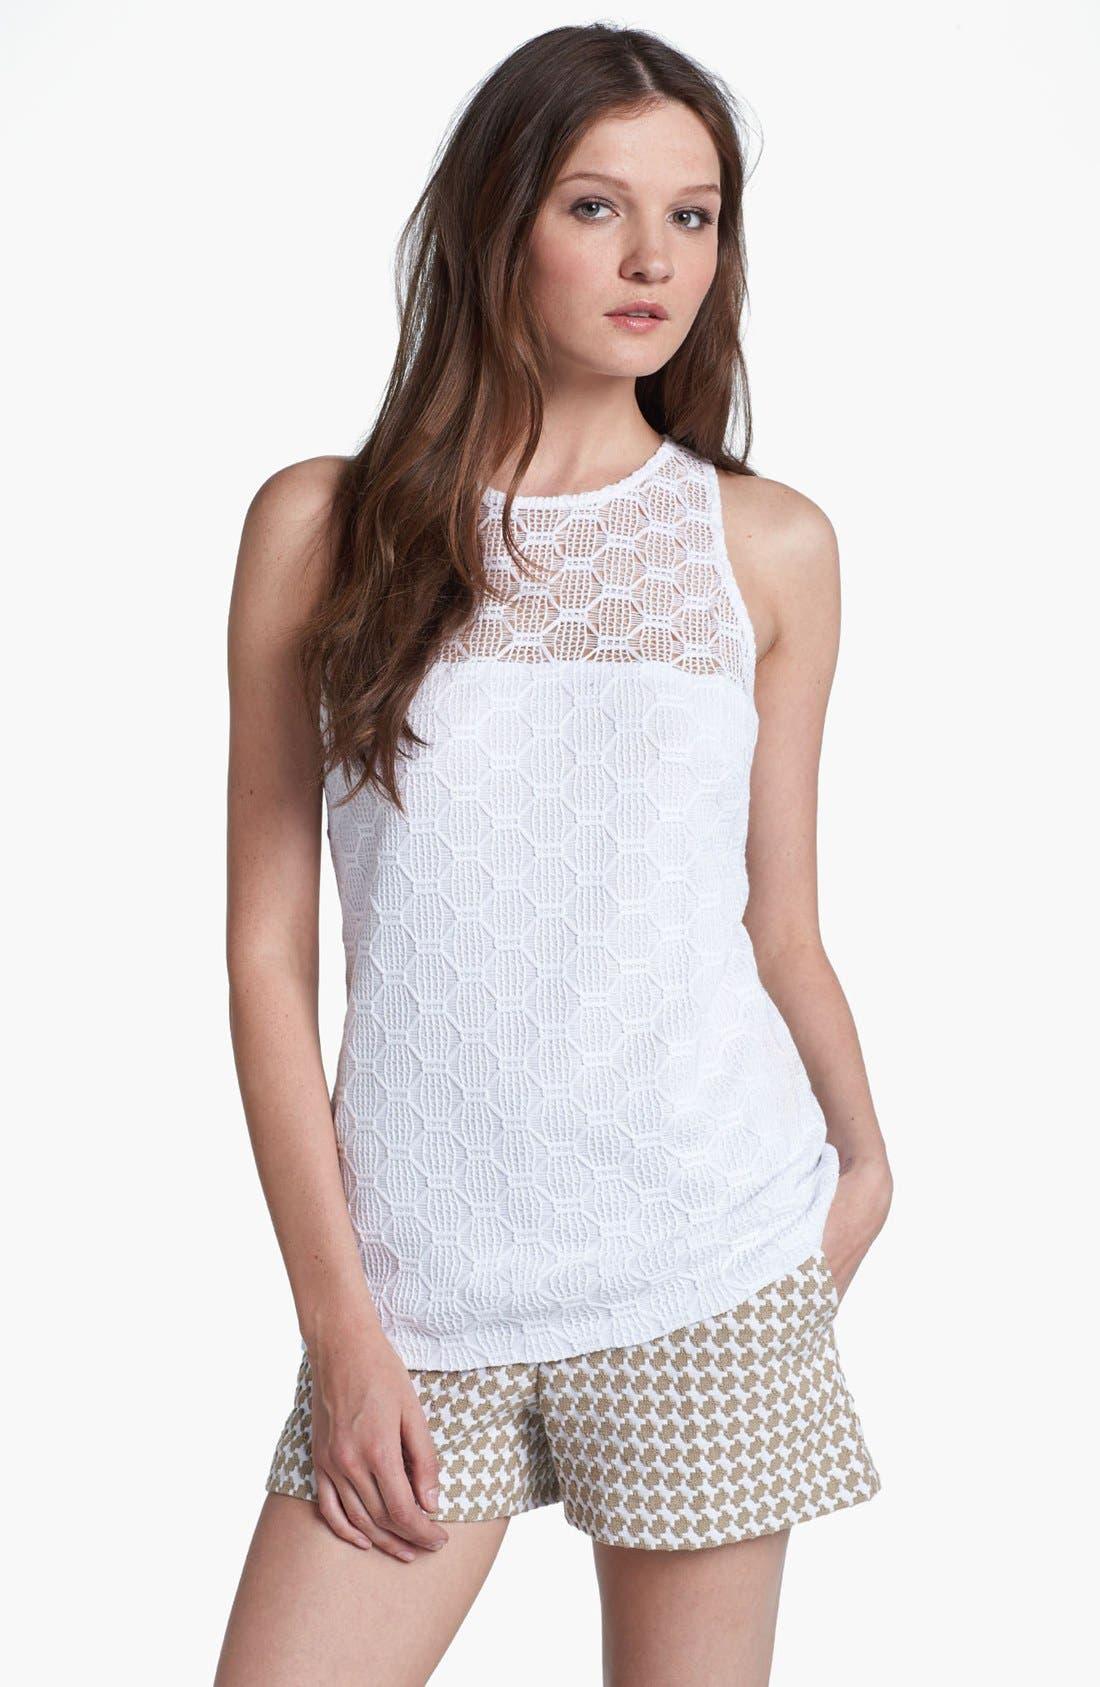 Alternate Image 1 Selected - Trina Turk 'Deanna' Hexagon Open Lace Top